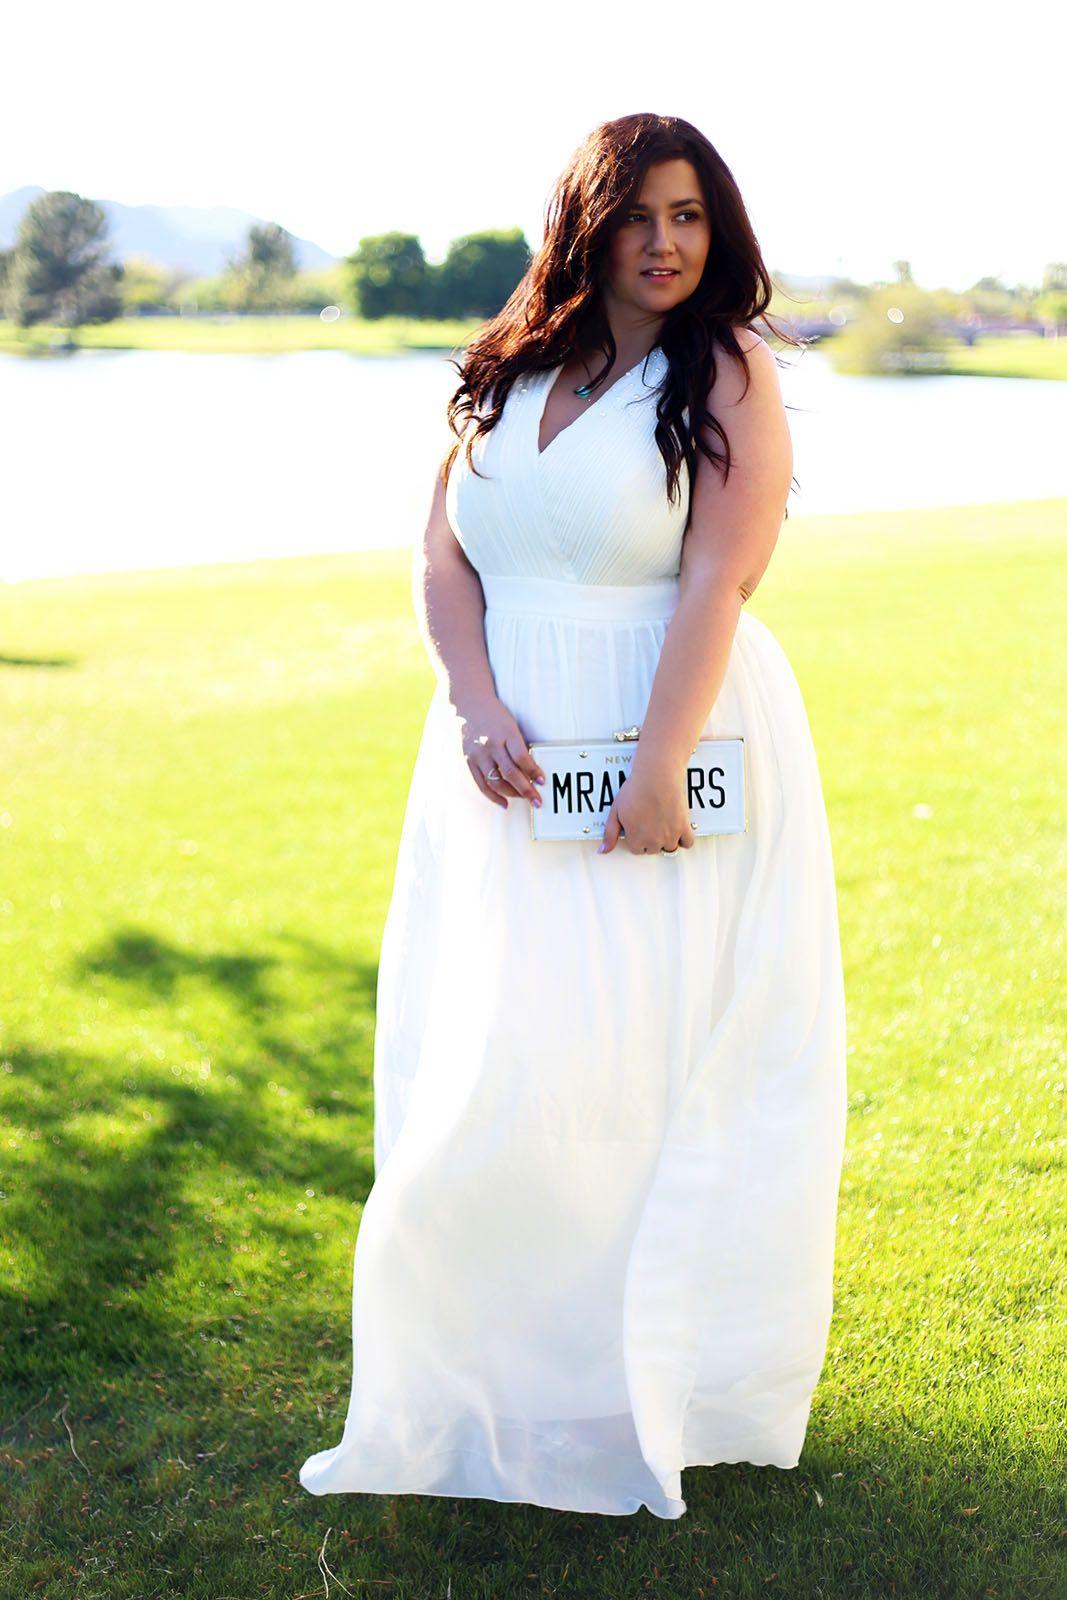 plus size princess wedding gown dress whimsical white dress